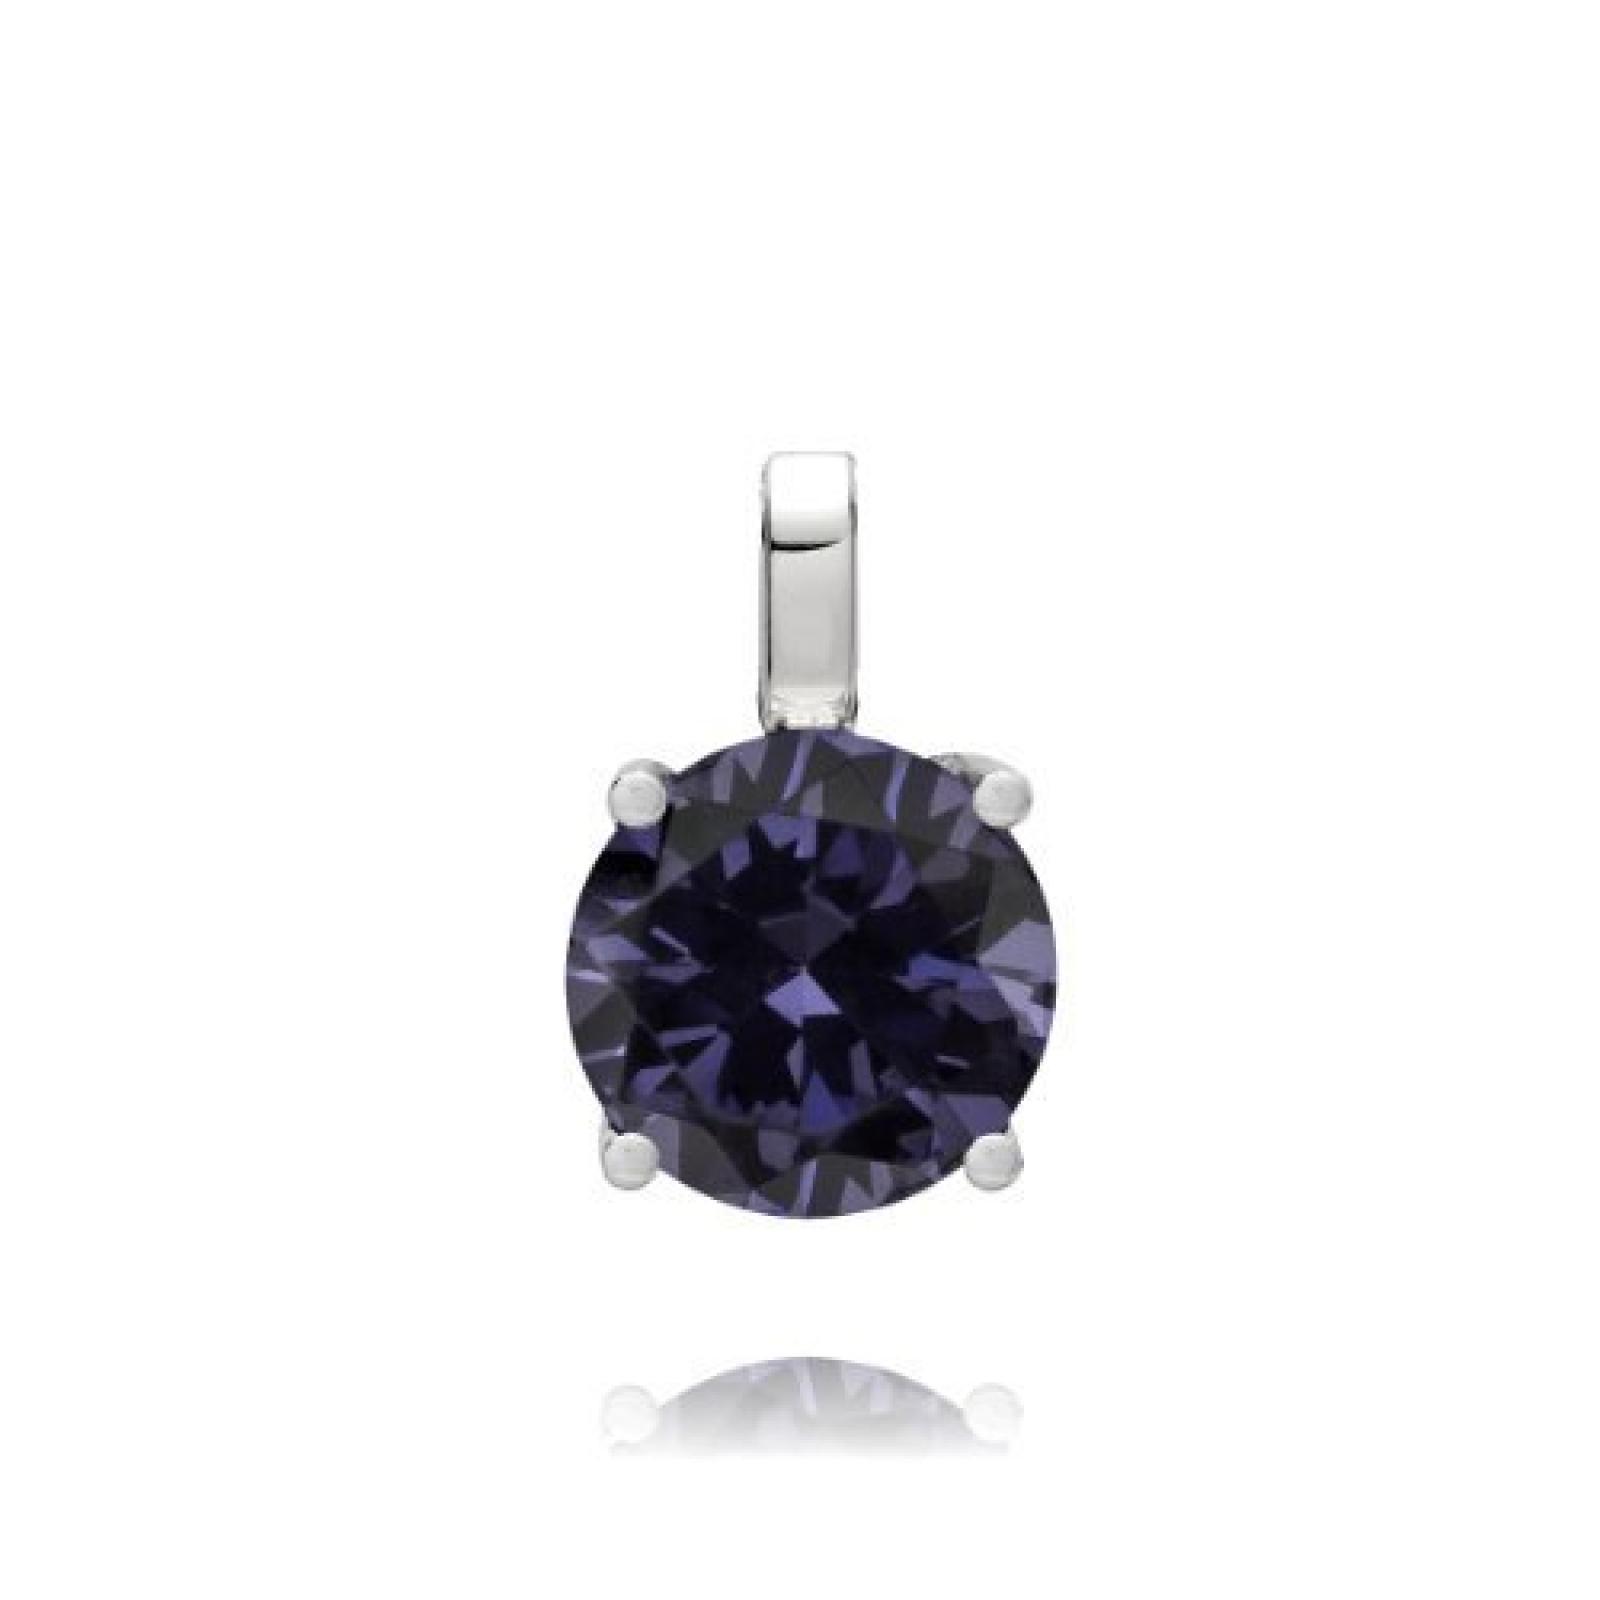 Rafaela Donata Damen-Anhänger Classic Collection 925 Sterling Silber Zirkonia tansanitfarben 60837055